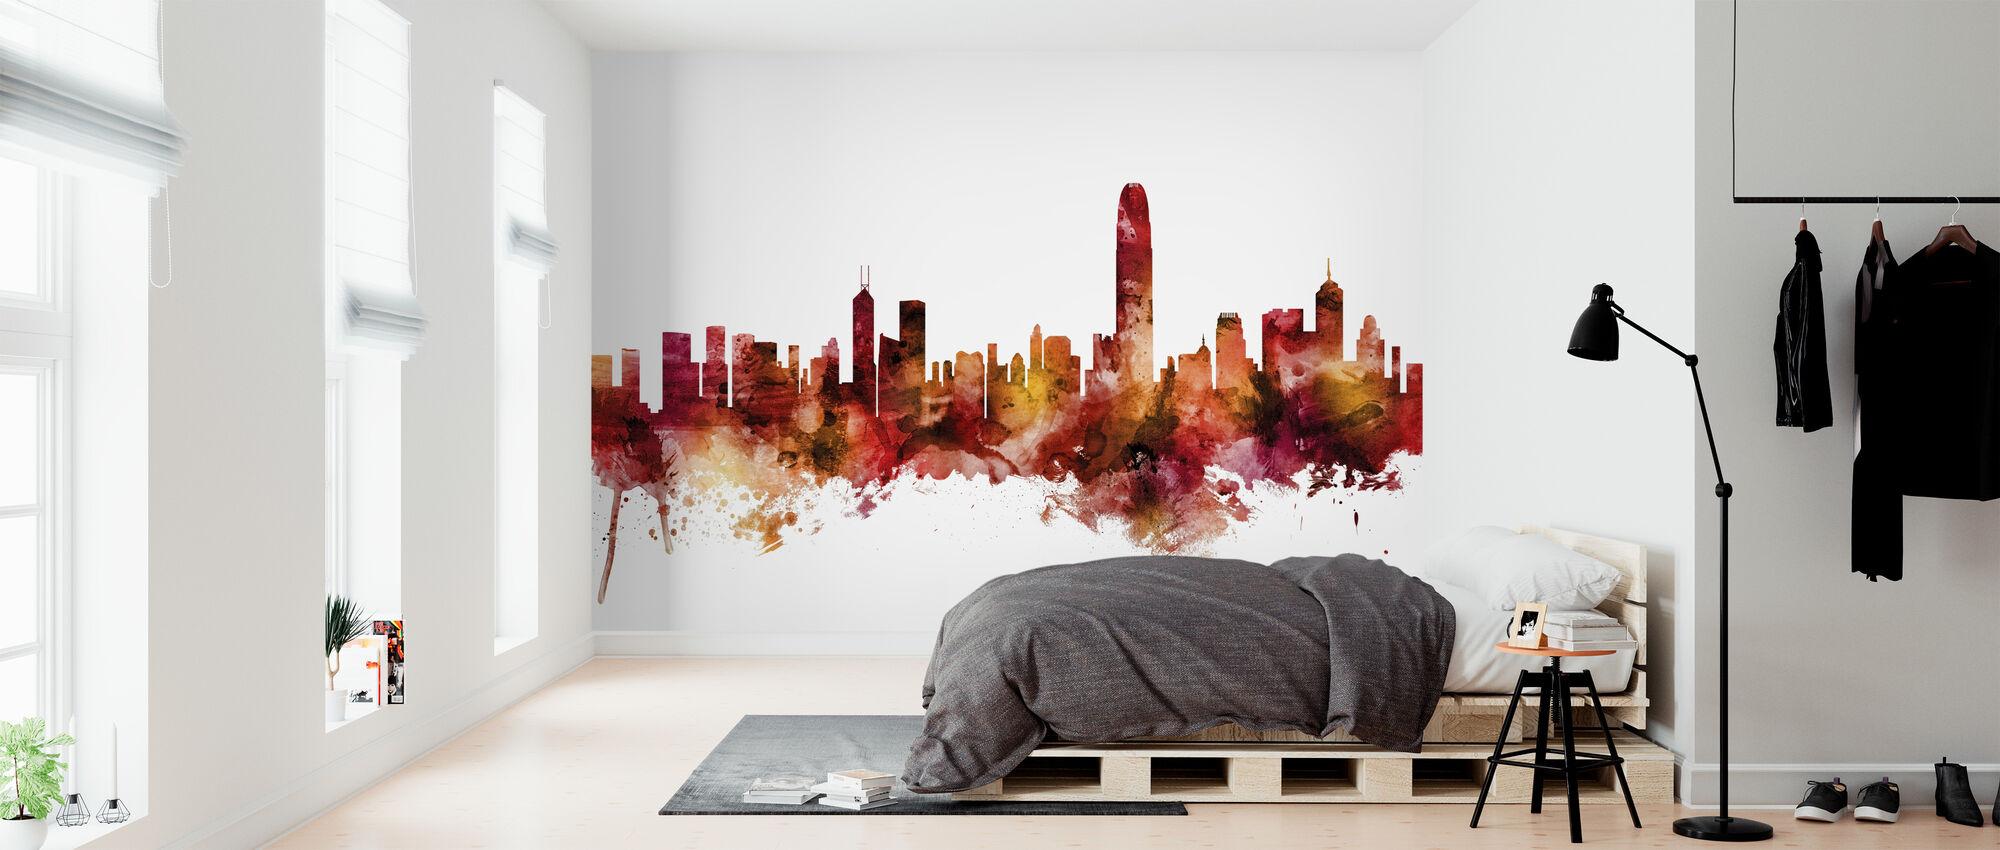 Hong Kong Skyline - Wallpaper - Bedroom